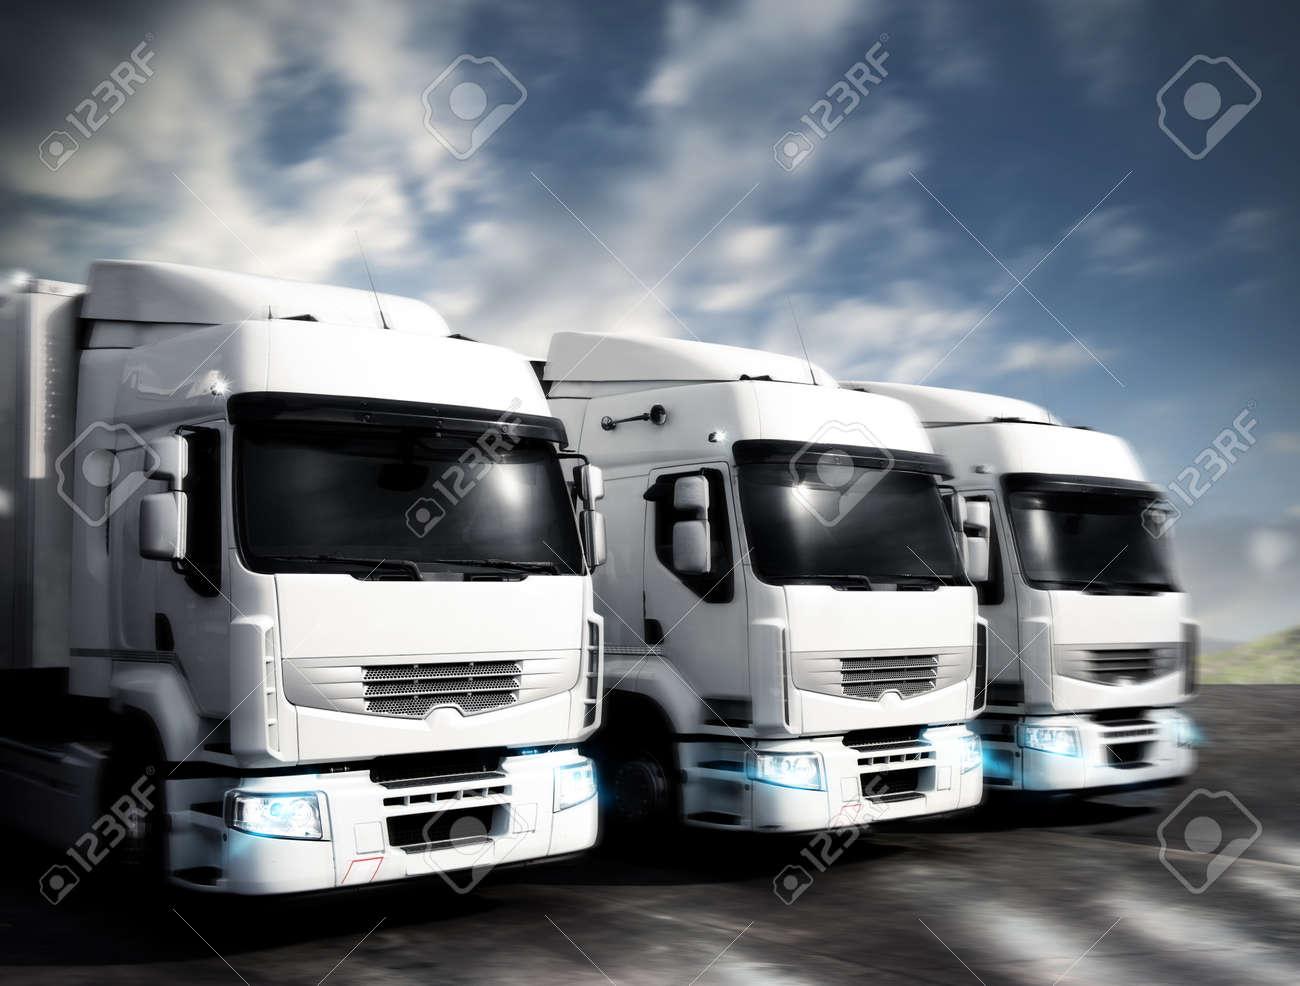 Three white articulated trucks on the road Standard-Bild - 58409557